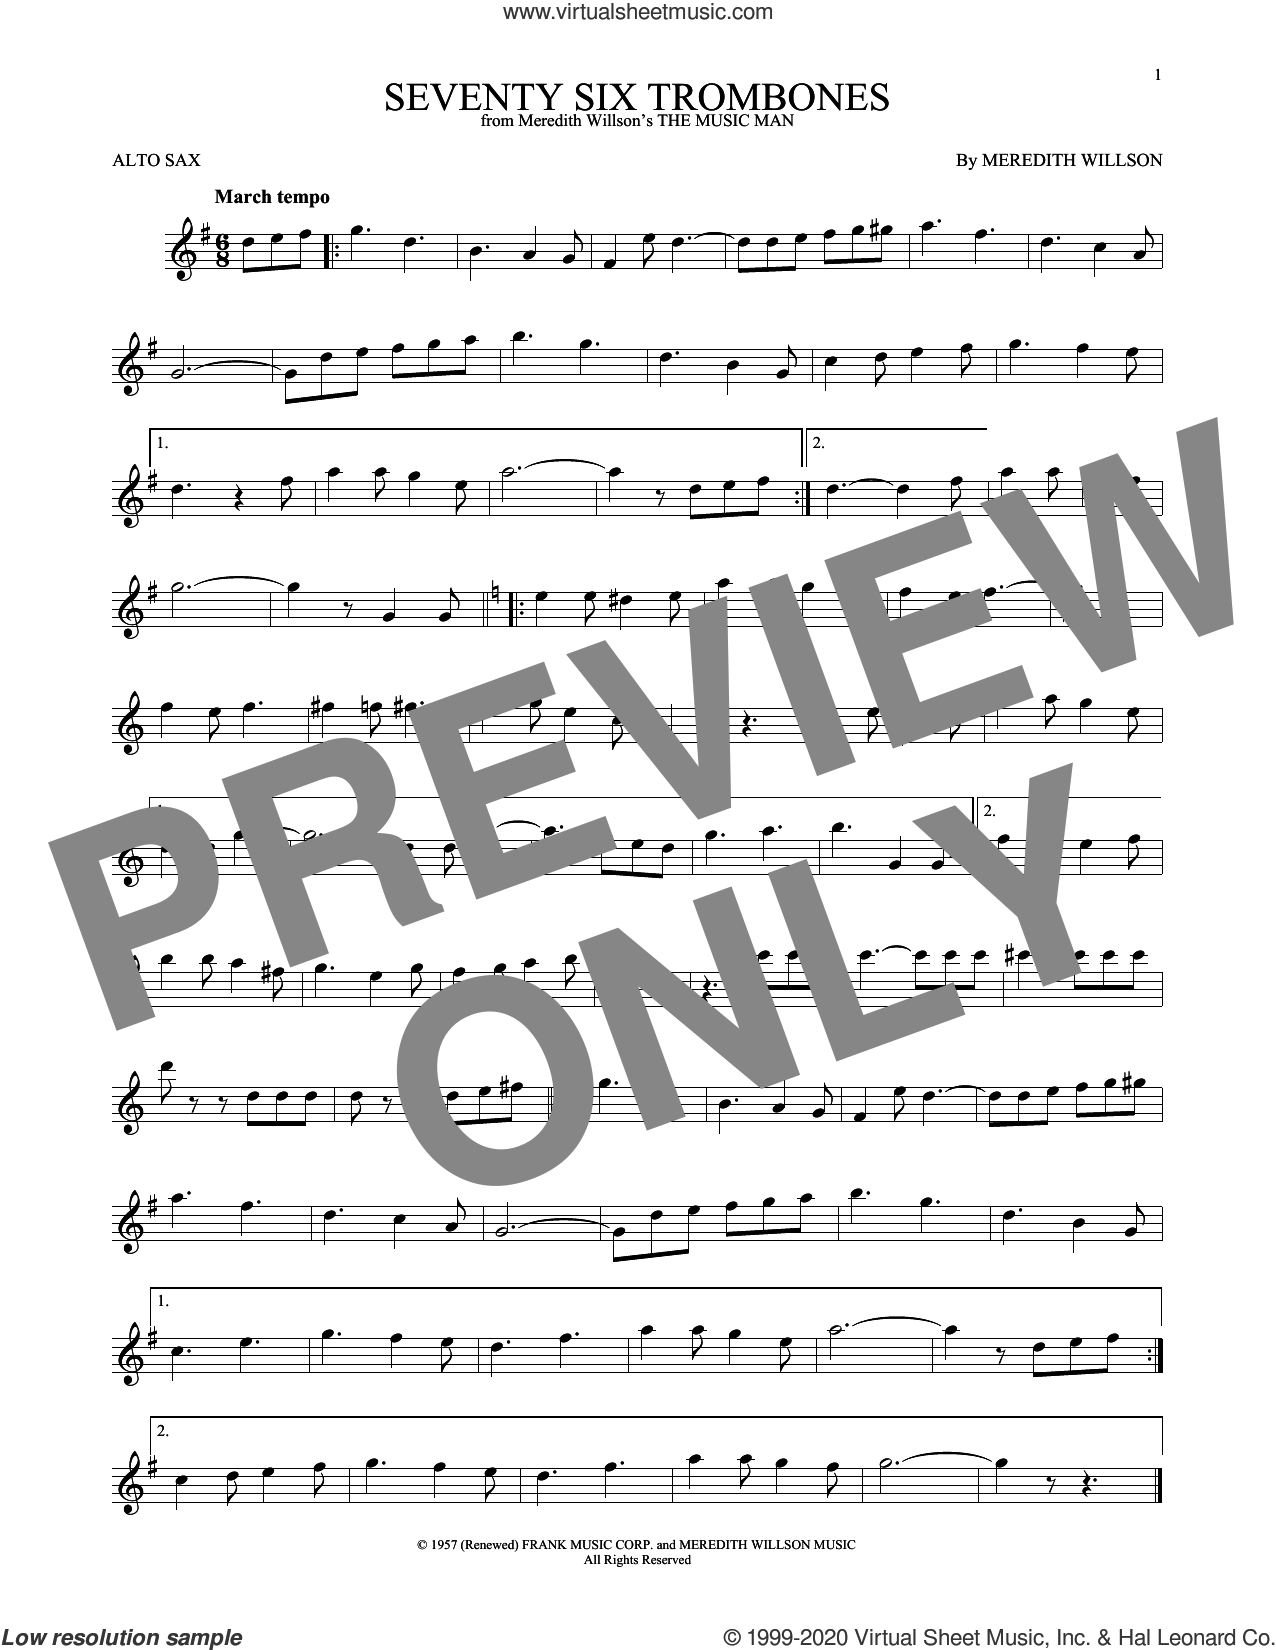 Seventy Six Trombones sheet music for alto saxophone solo by Meredith Willson, intermediate skill level